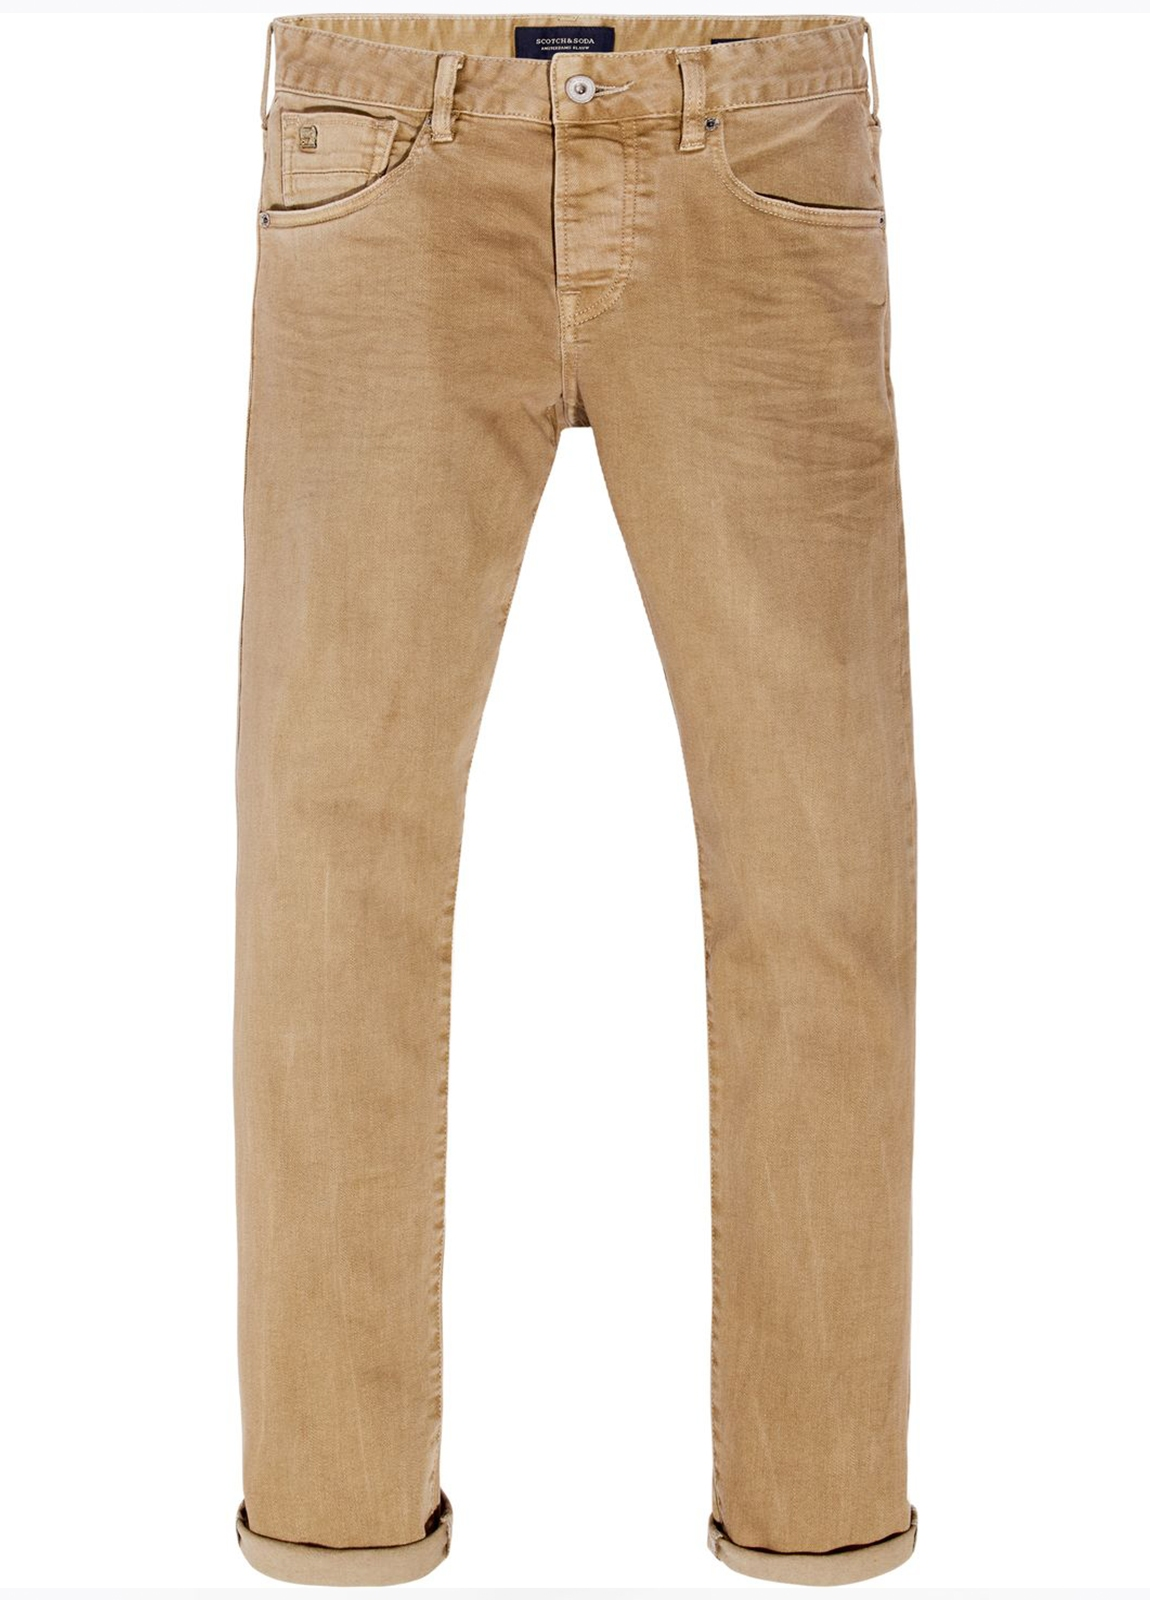 Pantalón 5 bolsillos regular slim fit modelo RALSTON denim elástico color beige. 78% Algodón 21% Poliéster 1% Elastano. - Ítem2